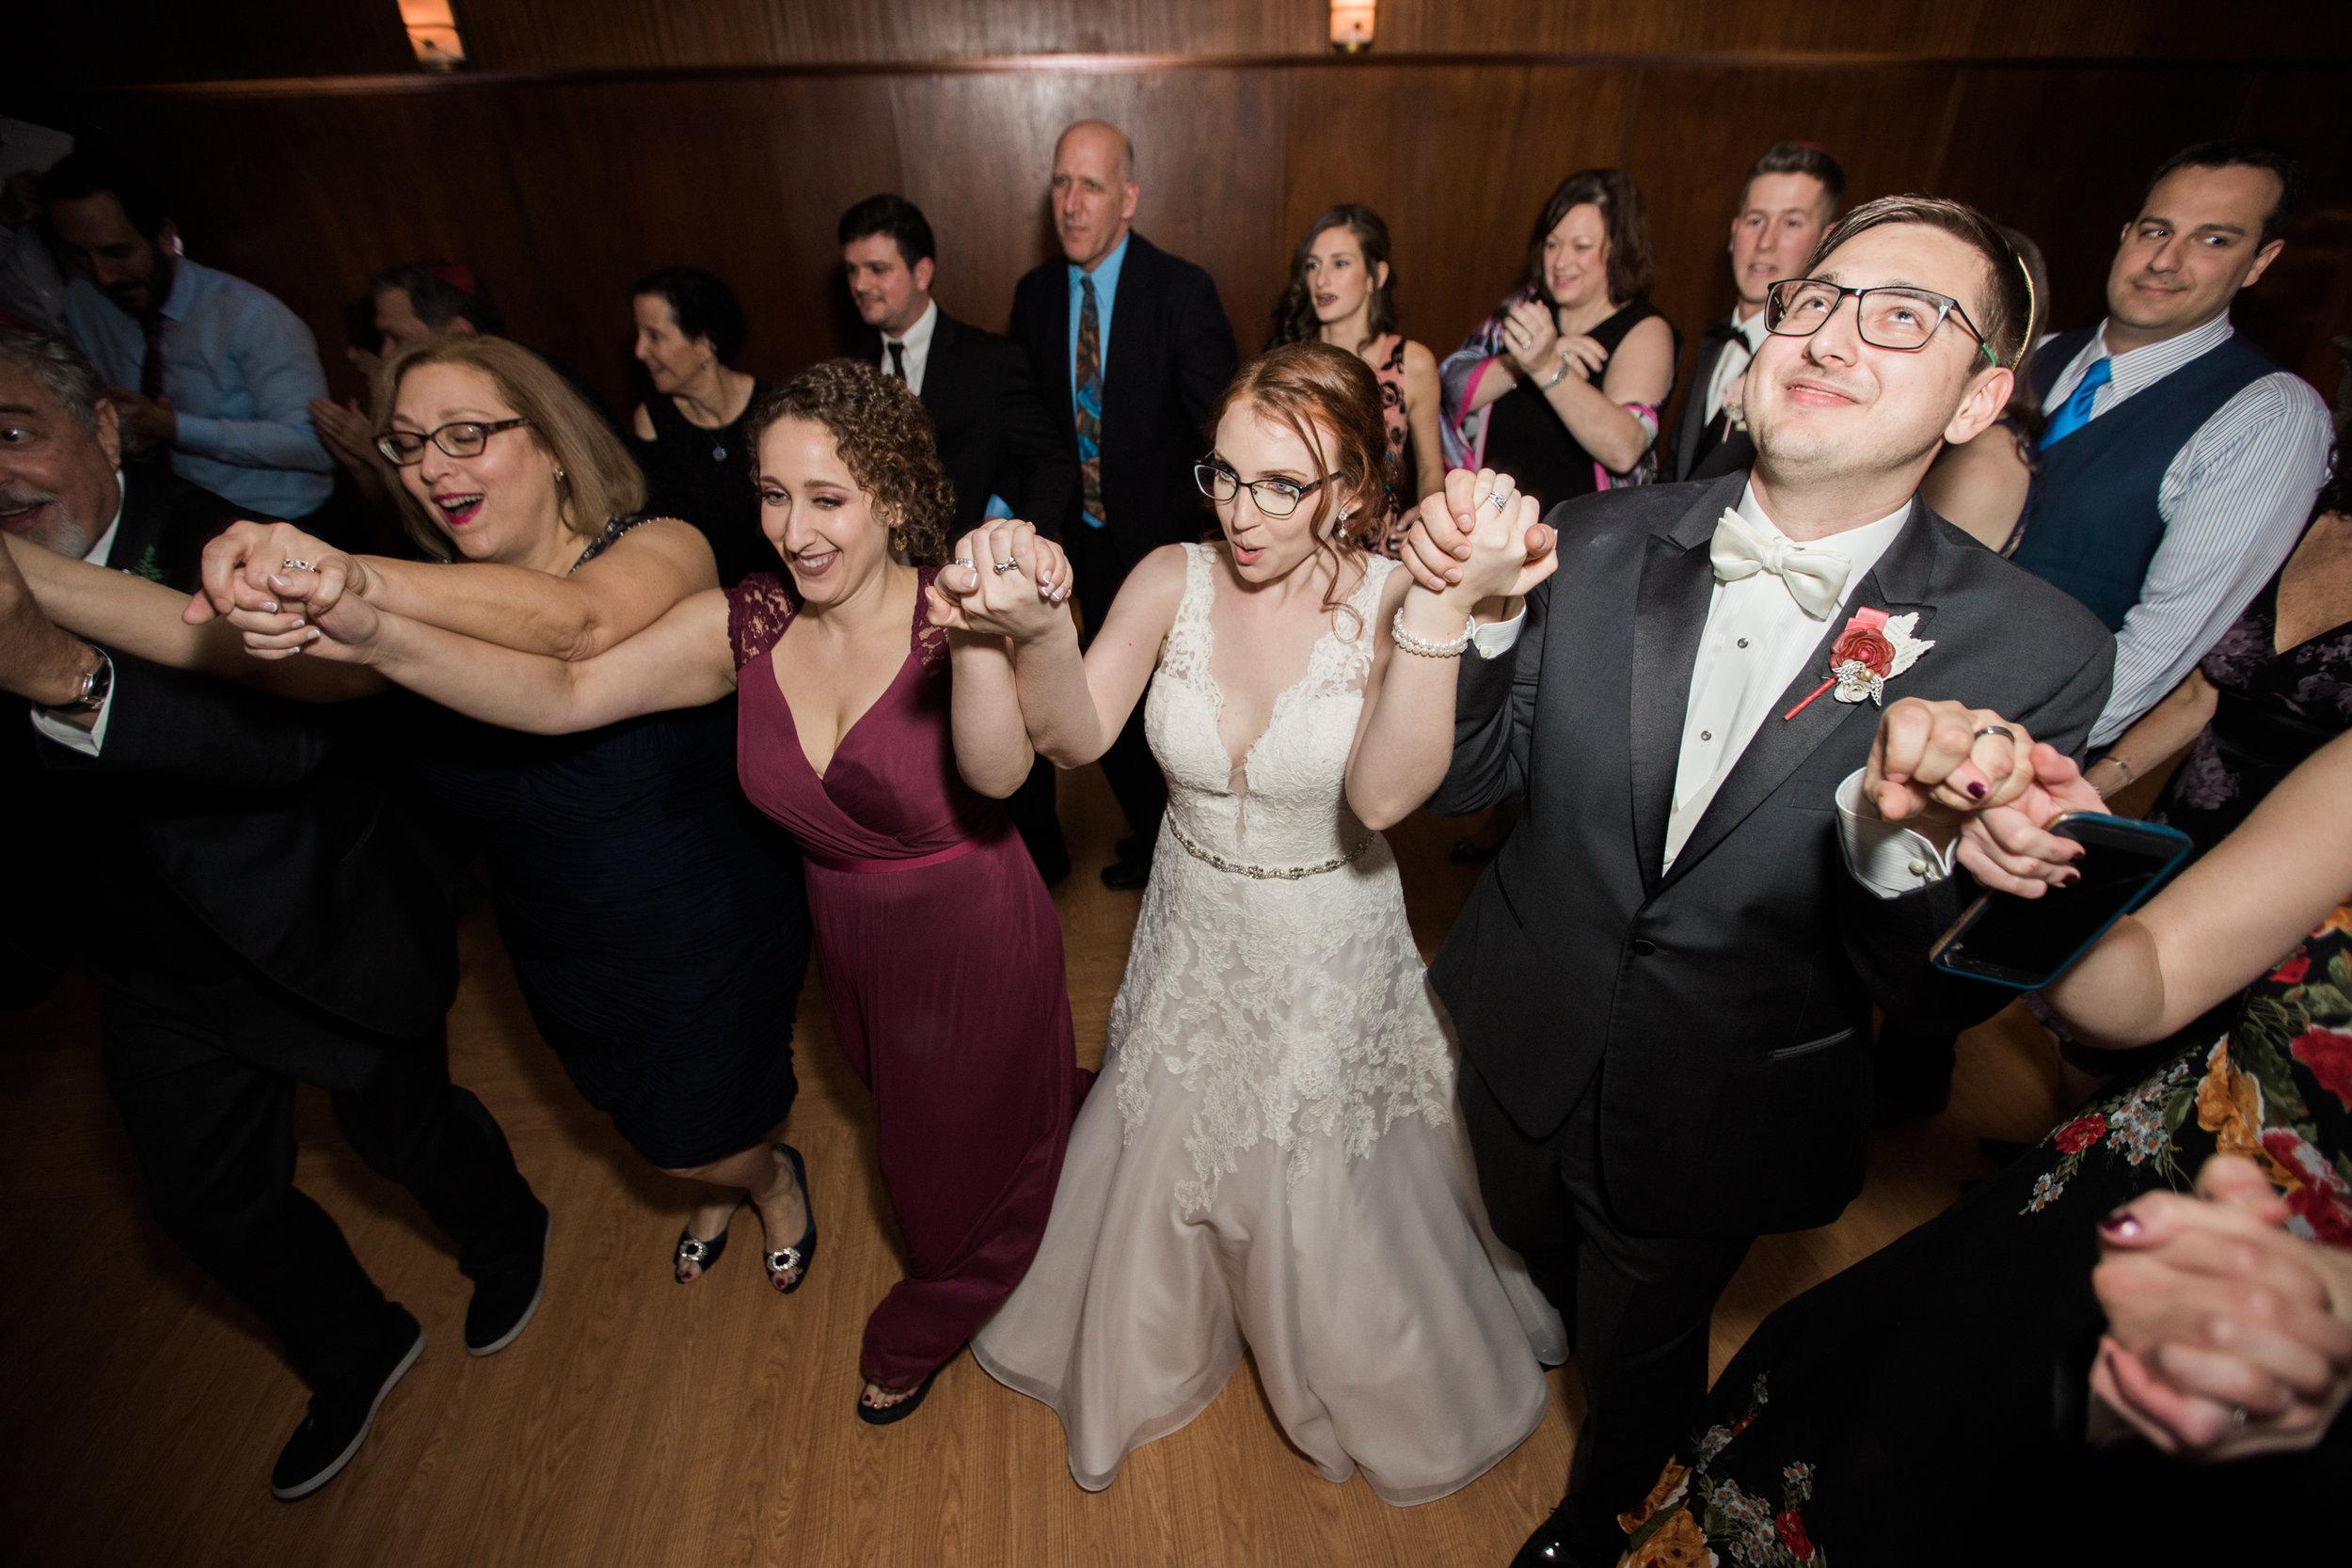 Harry Potter Wedding at Overhills Mansion Catonville Maryland Wedding Photographers Megapixels Media (104 of 134).jpg